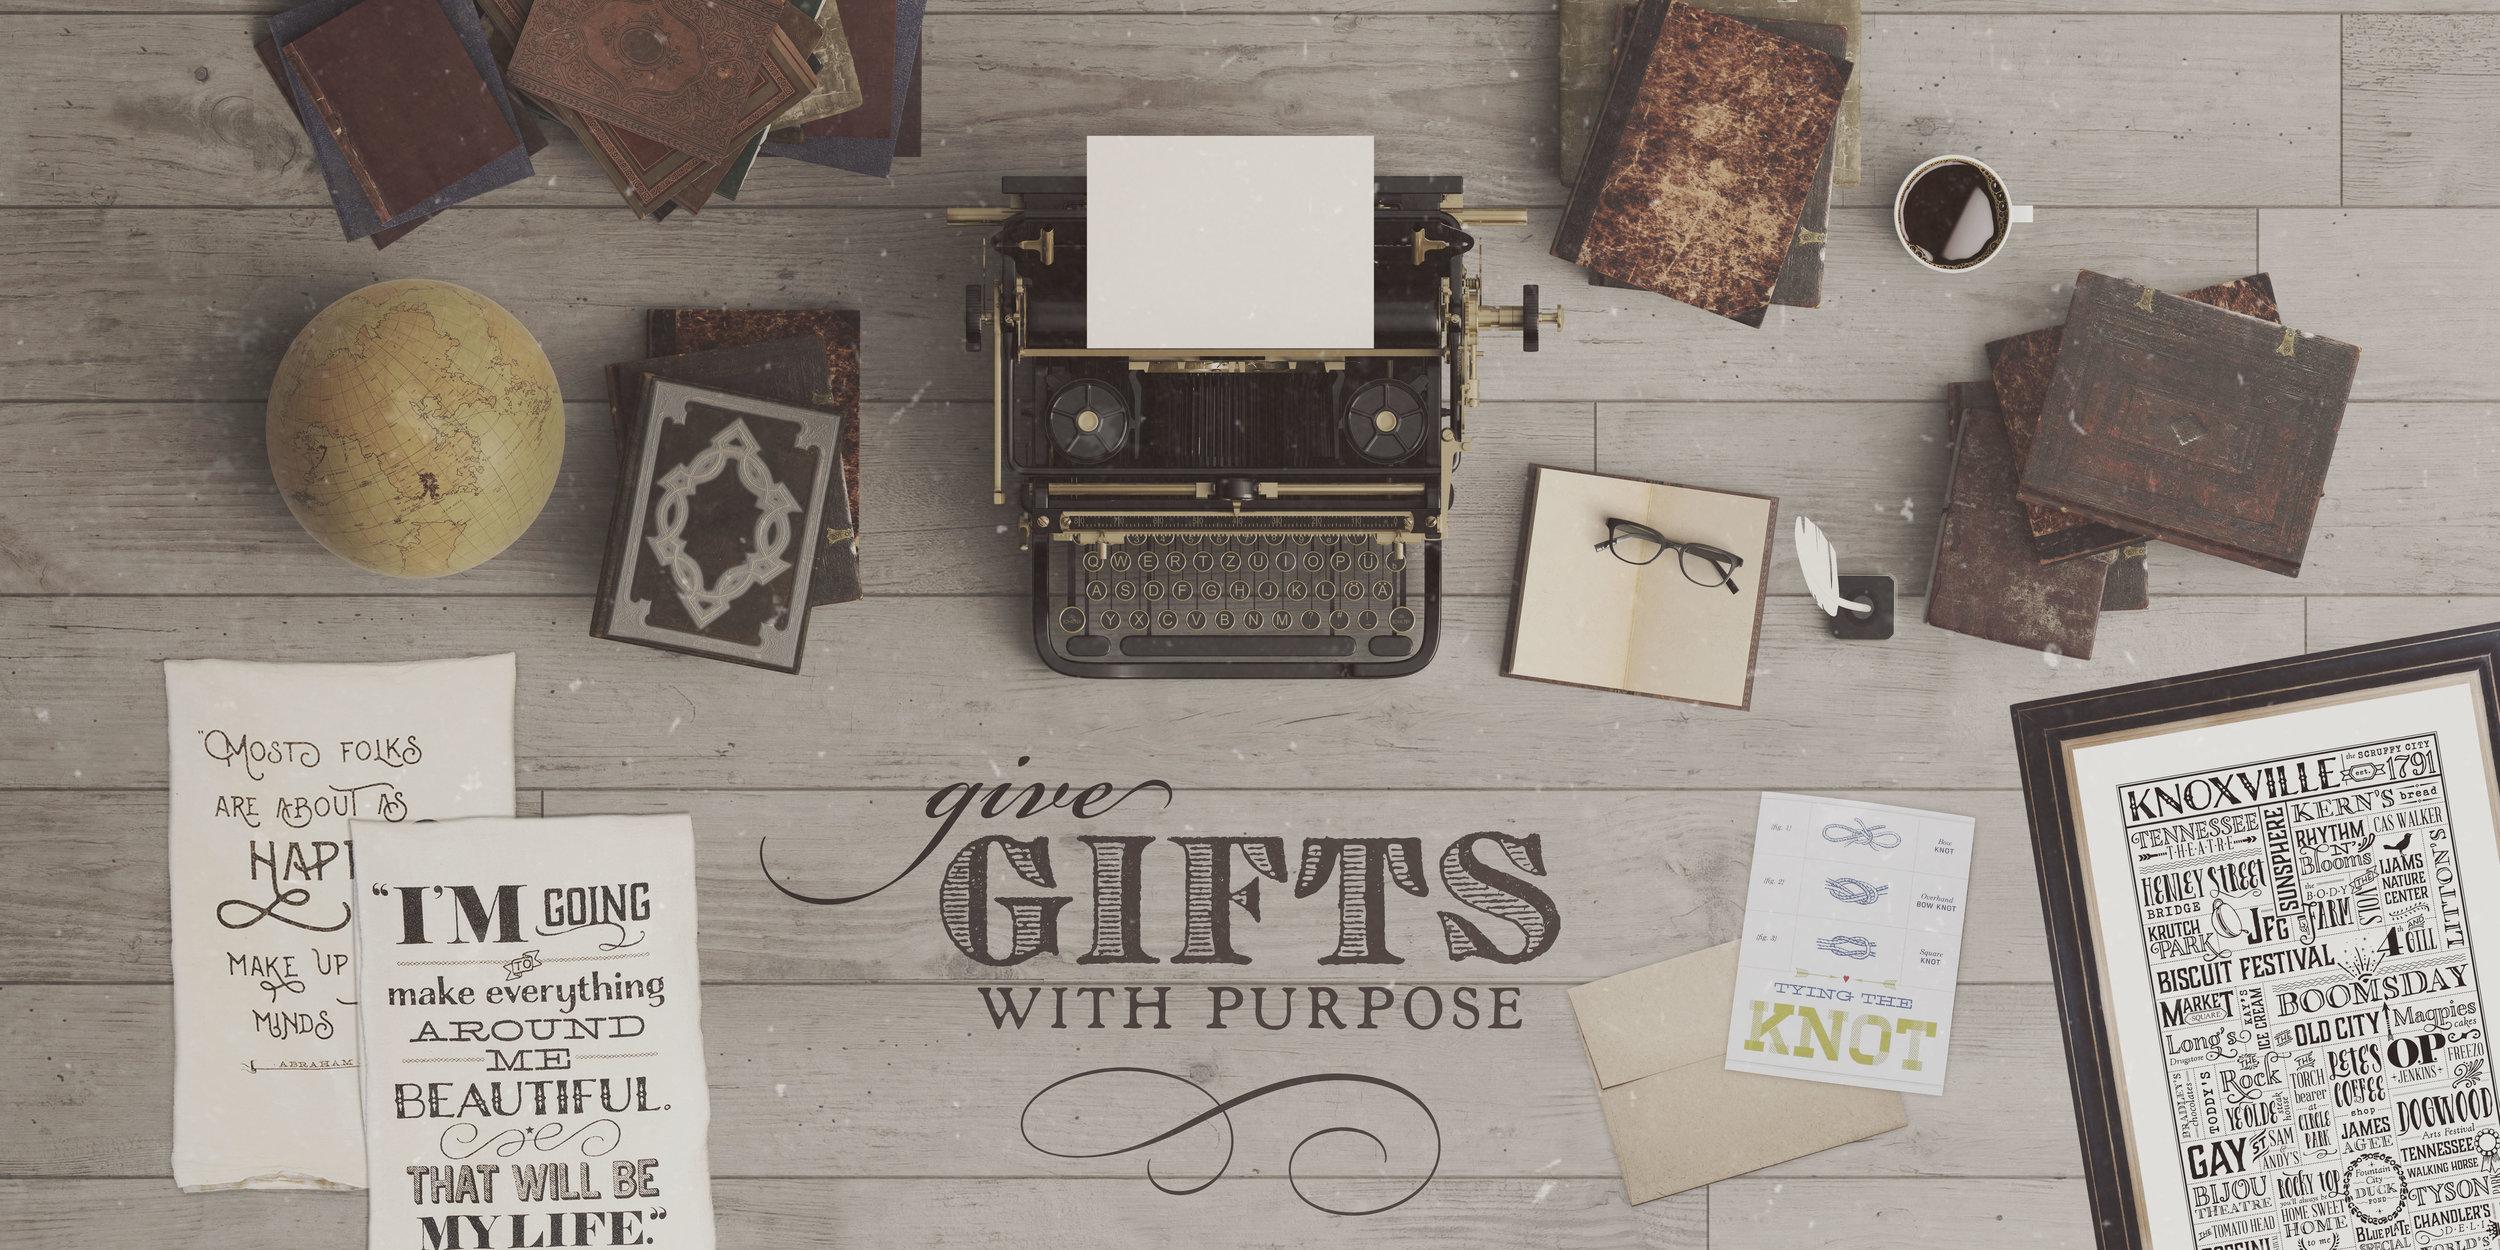 Image via The Happy Envelope website.